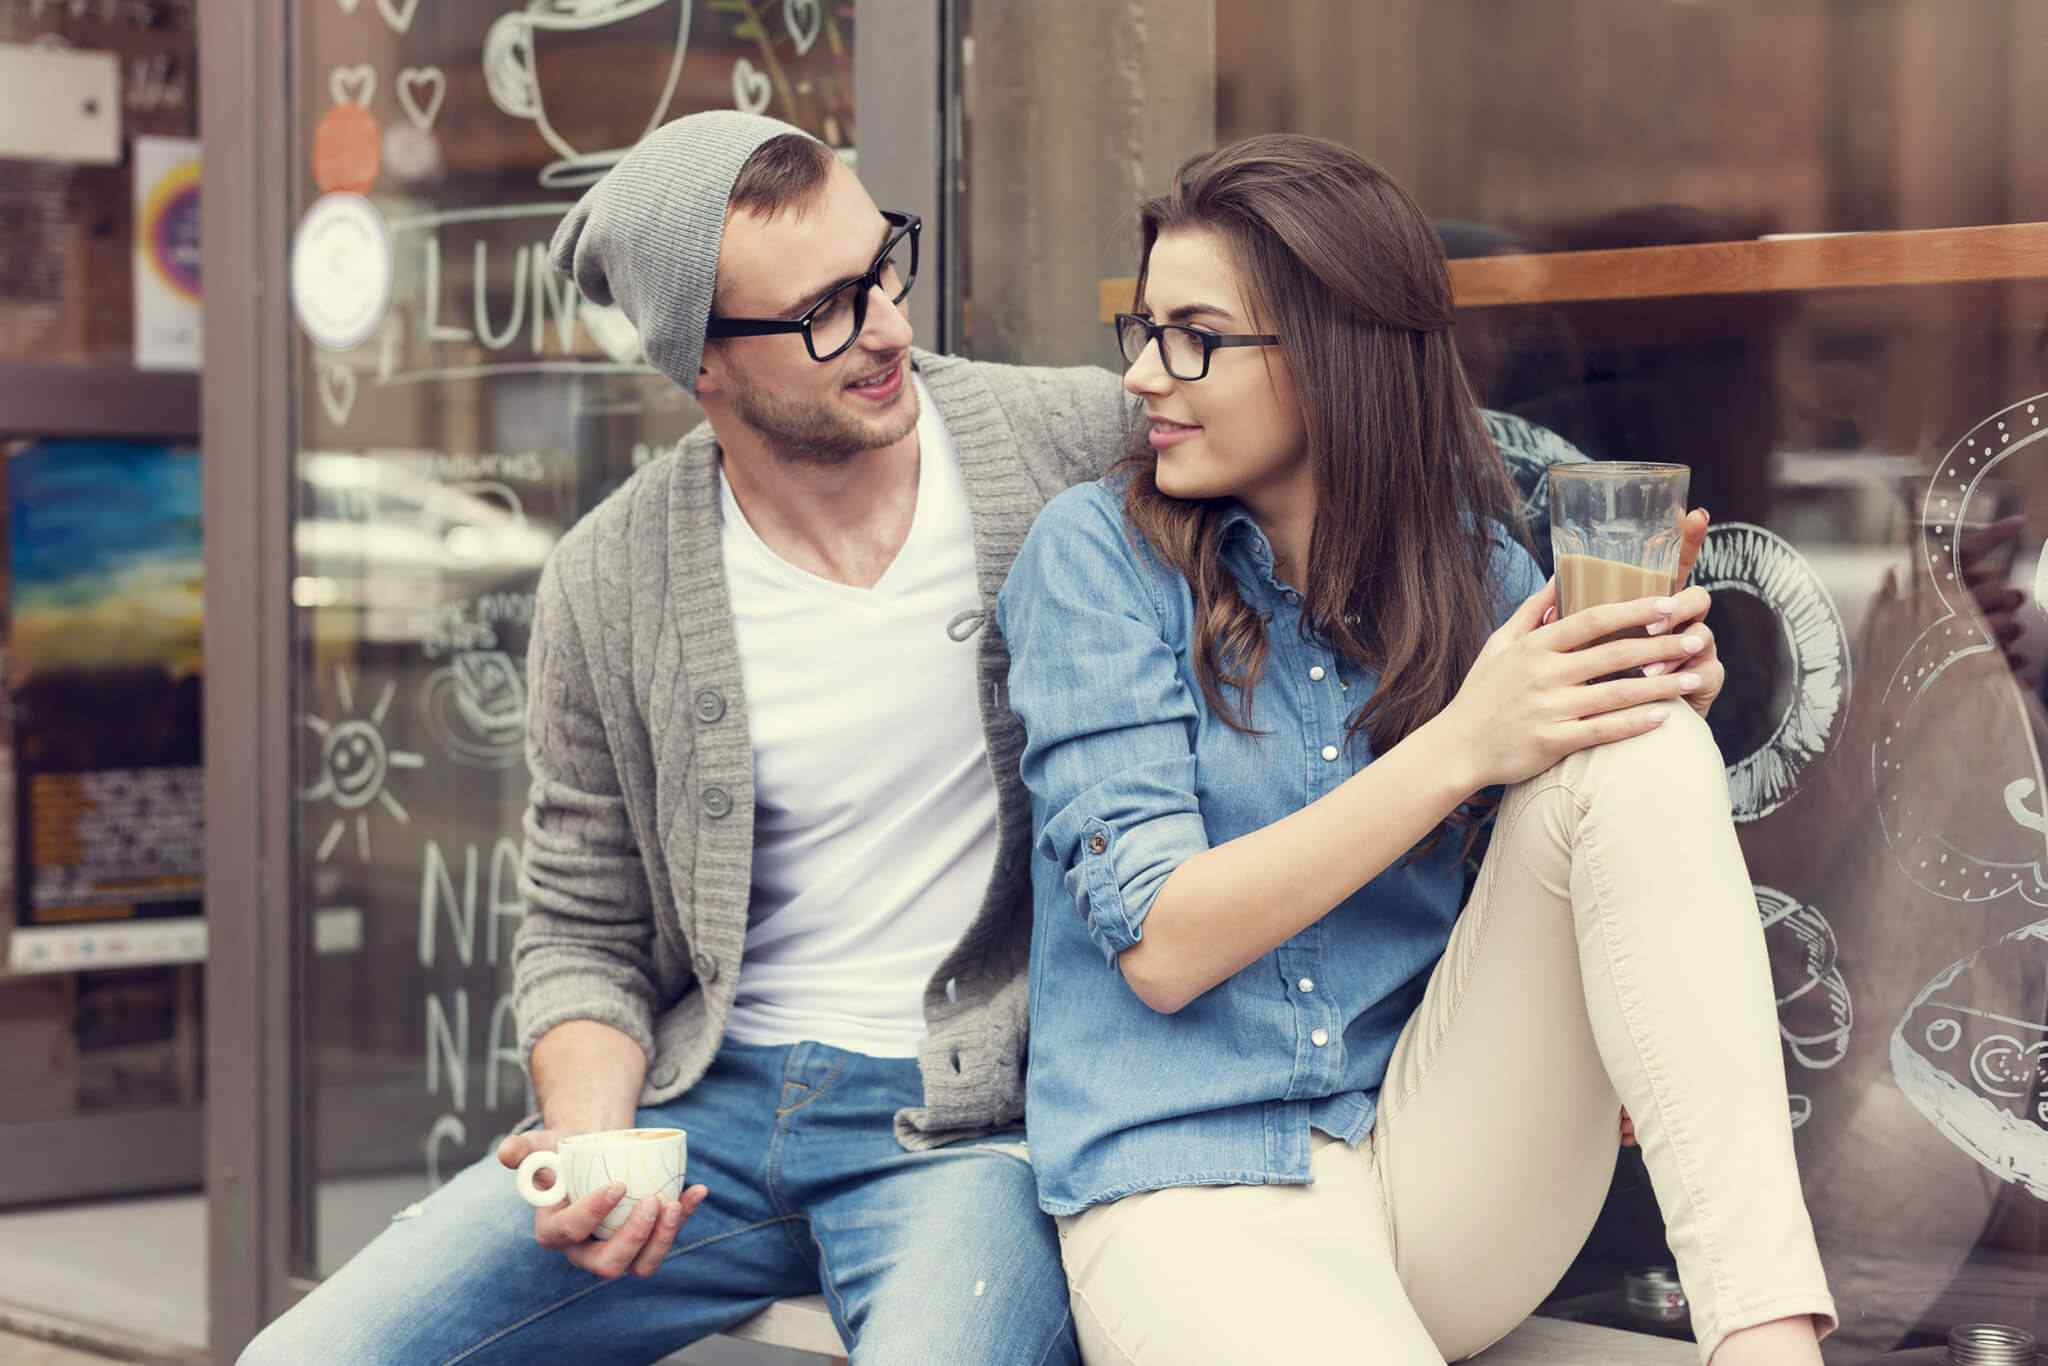 http://gotitasdepoliamor.com/wp-content/uploads/2018/01/img-class-marriage-02.jpg